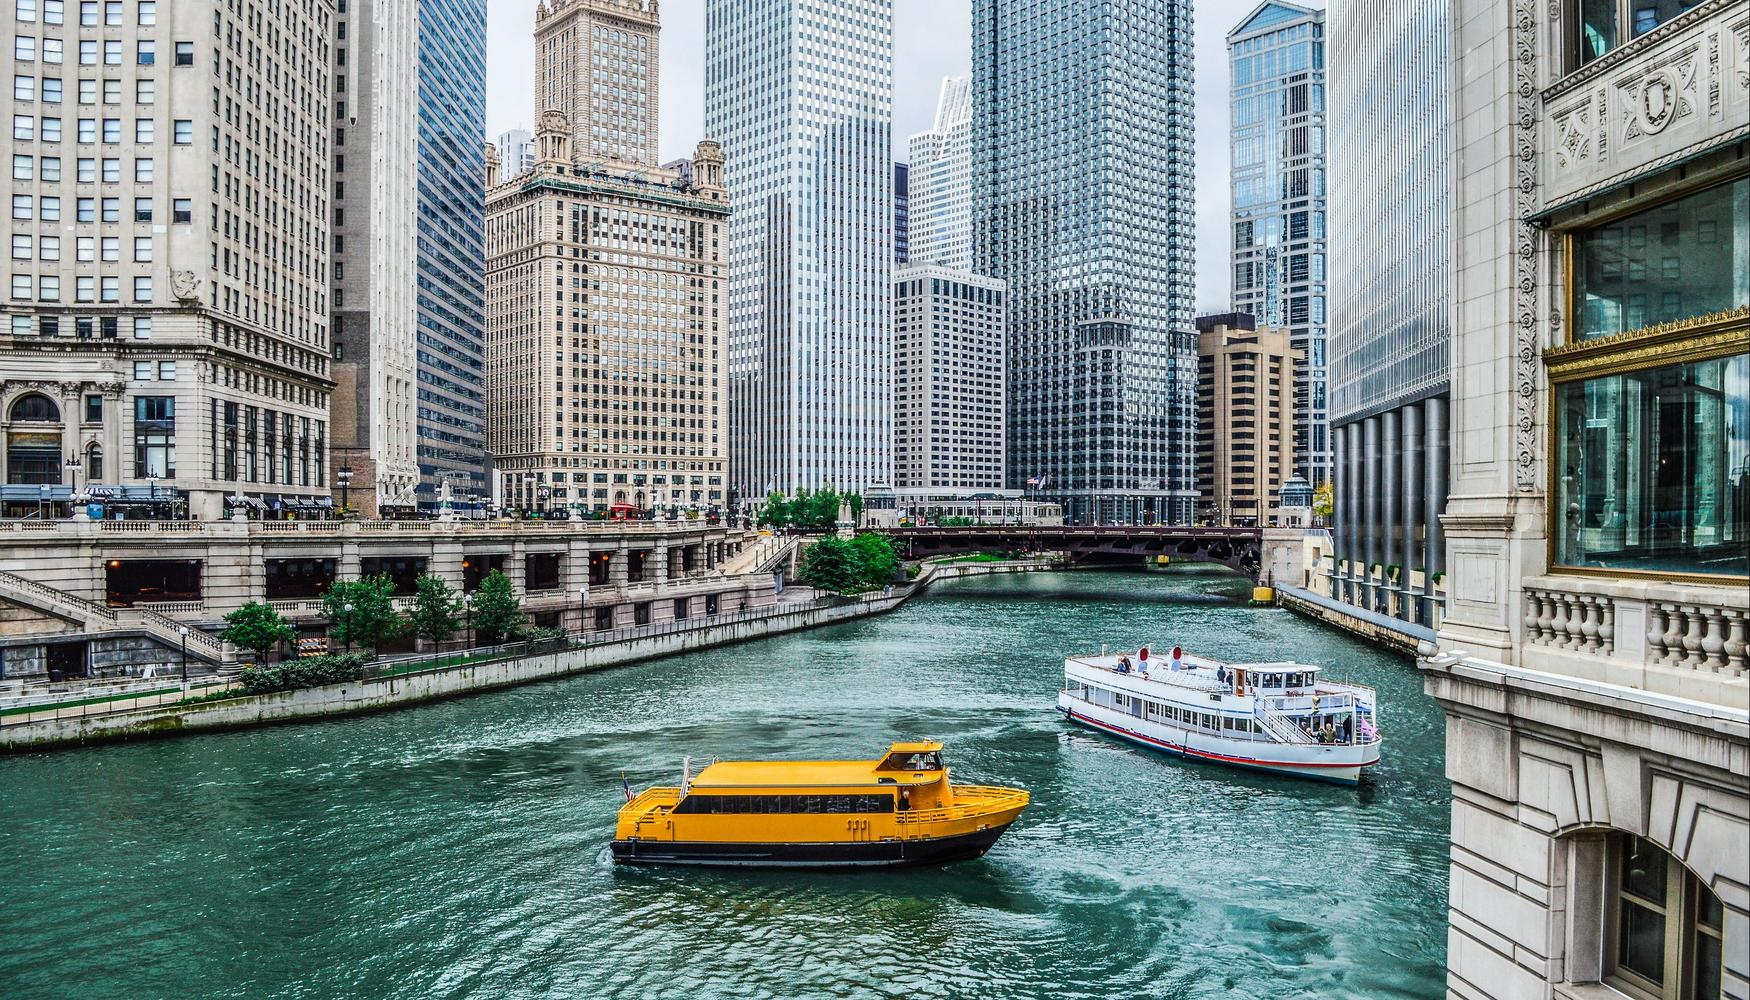 Alquiler de coches en Aeropuerto Chicago Greater Rockford